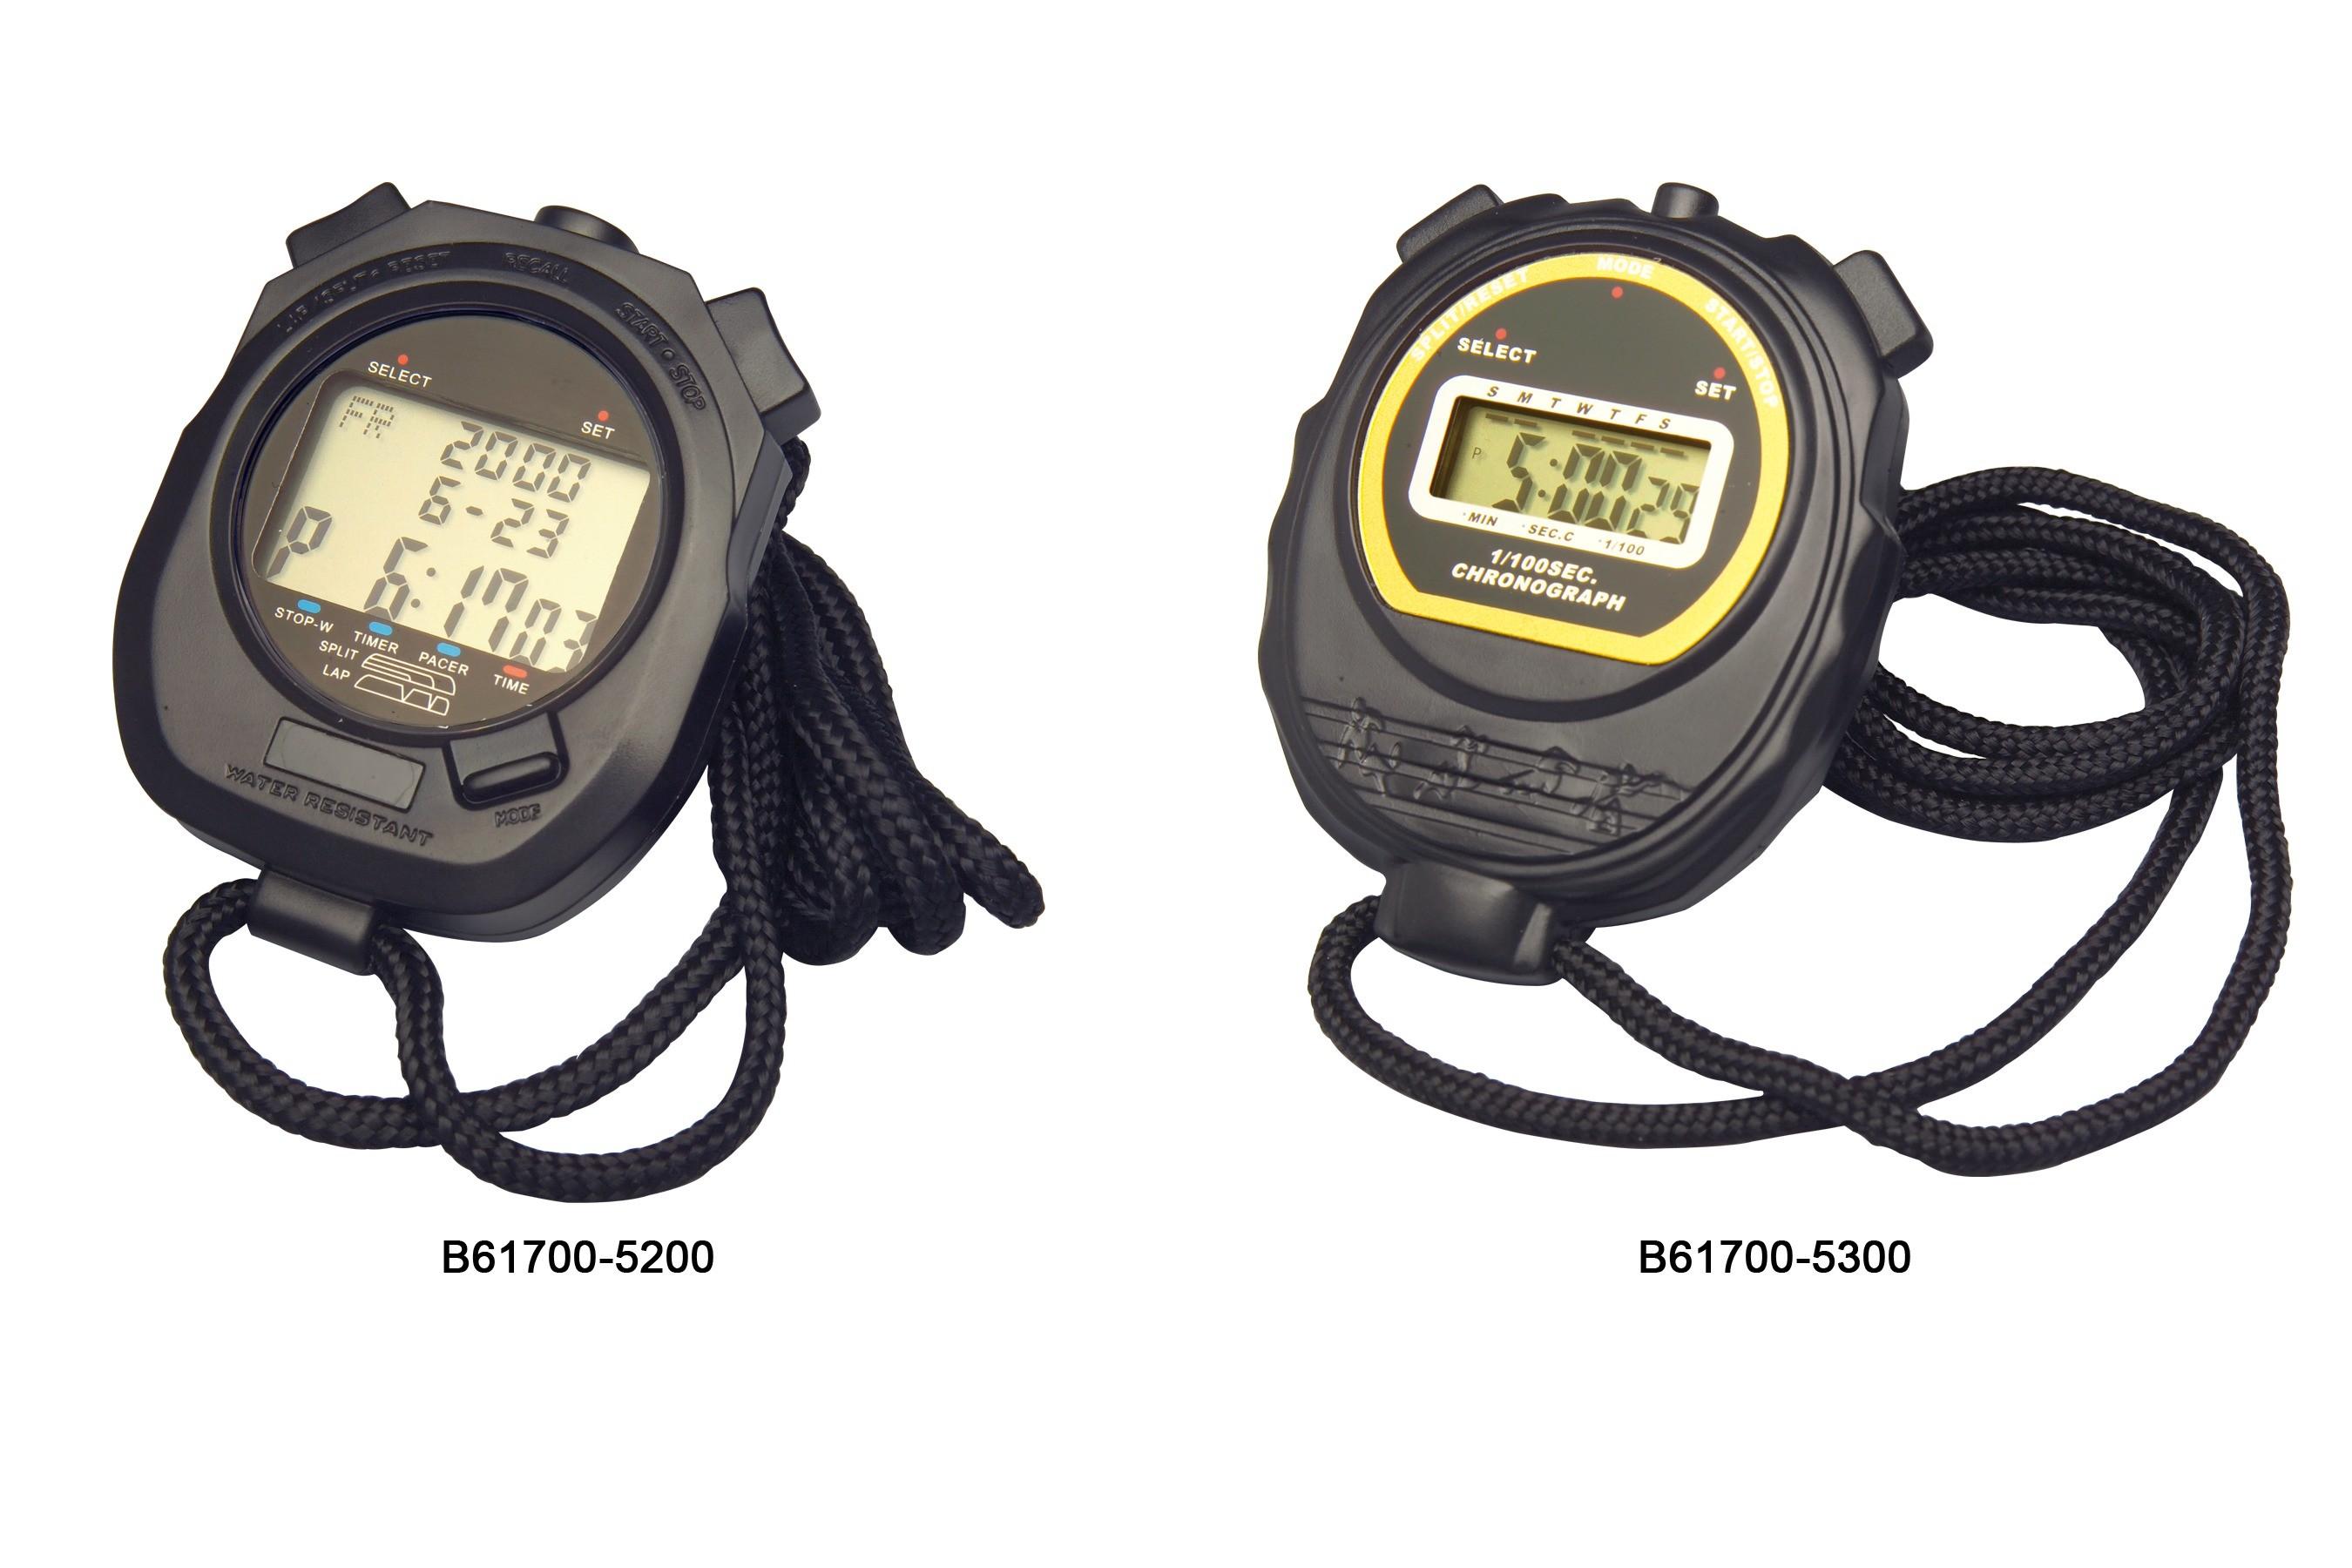 H-B DURAC Digital Stopwatches